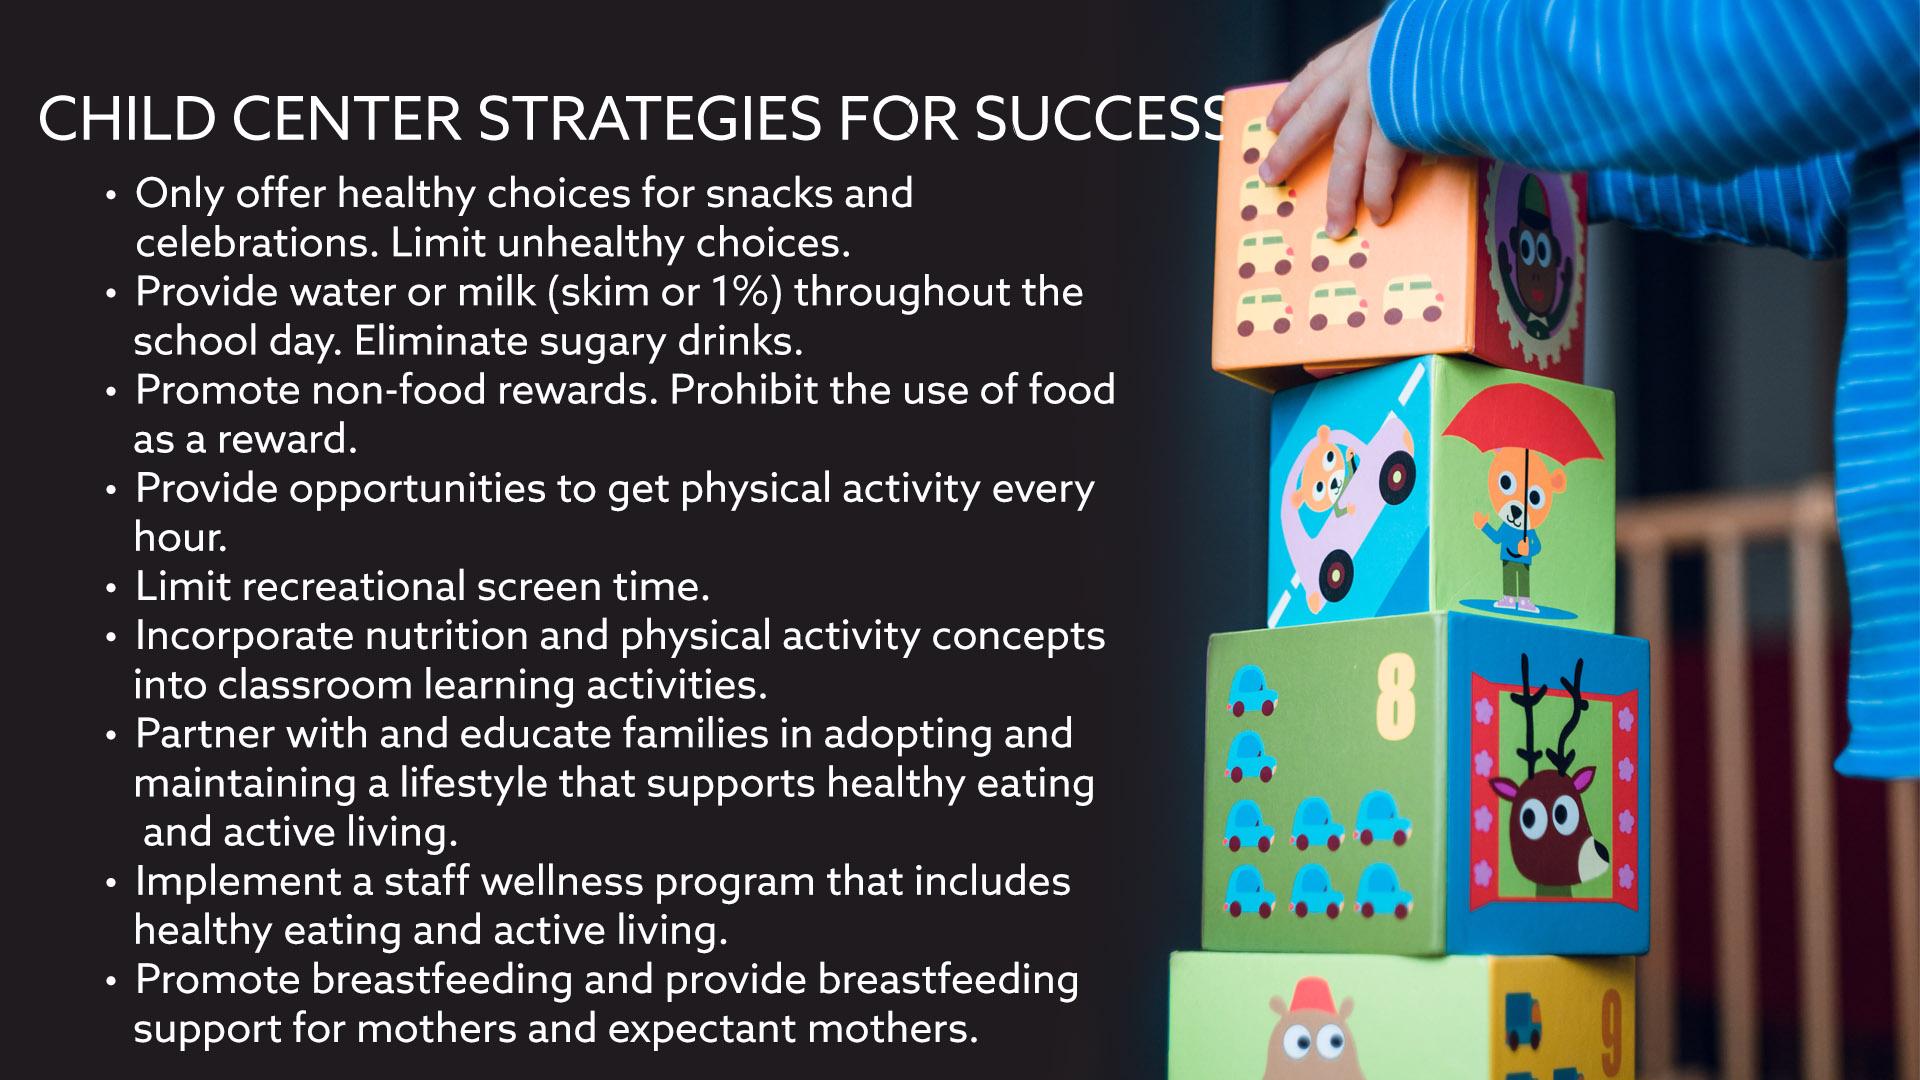 updatedstrategies for success.jpg